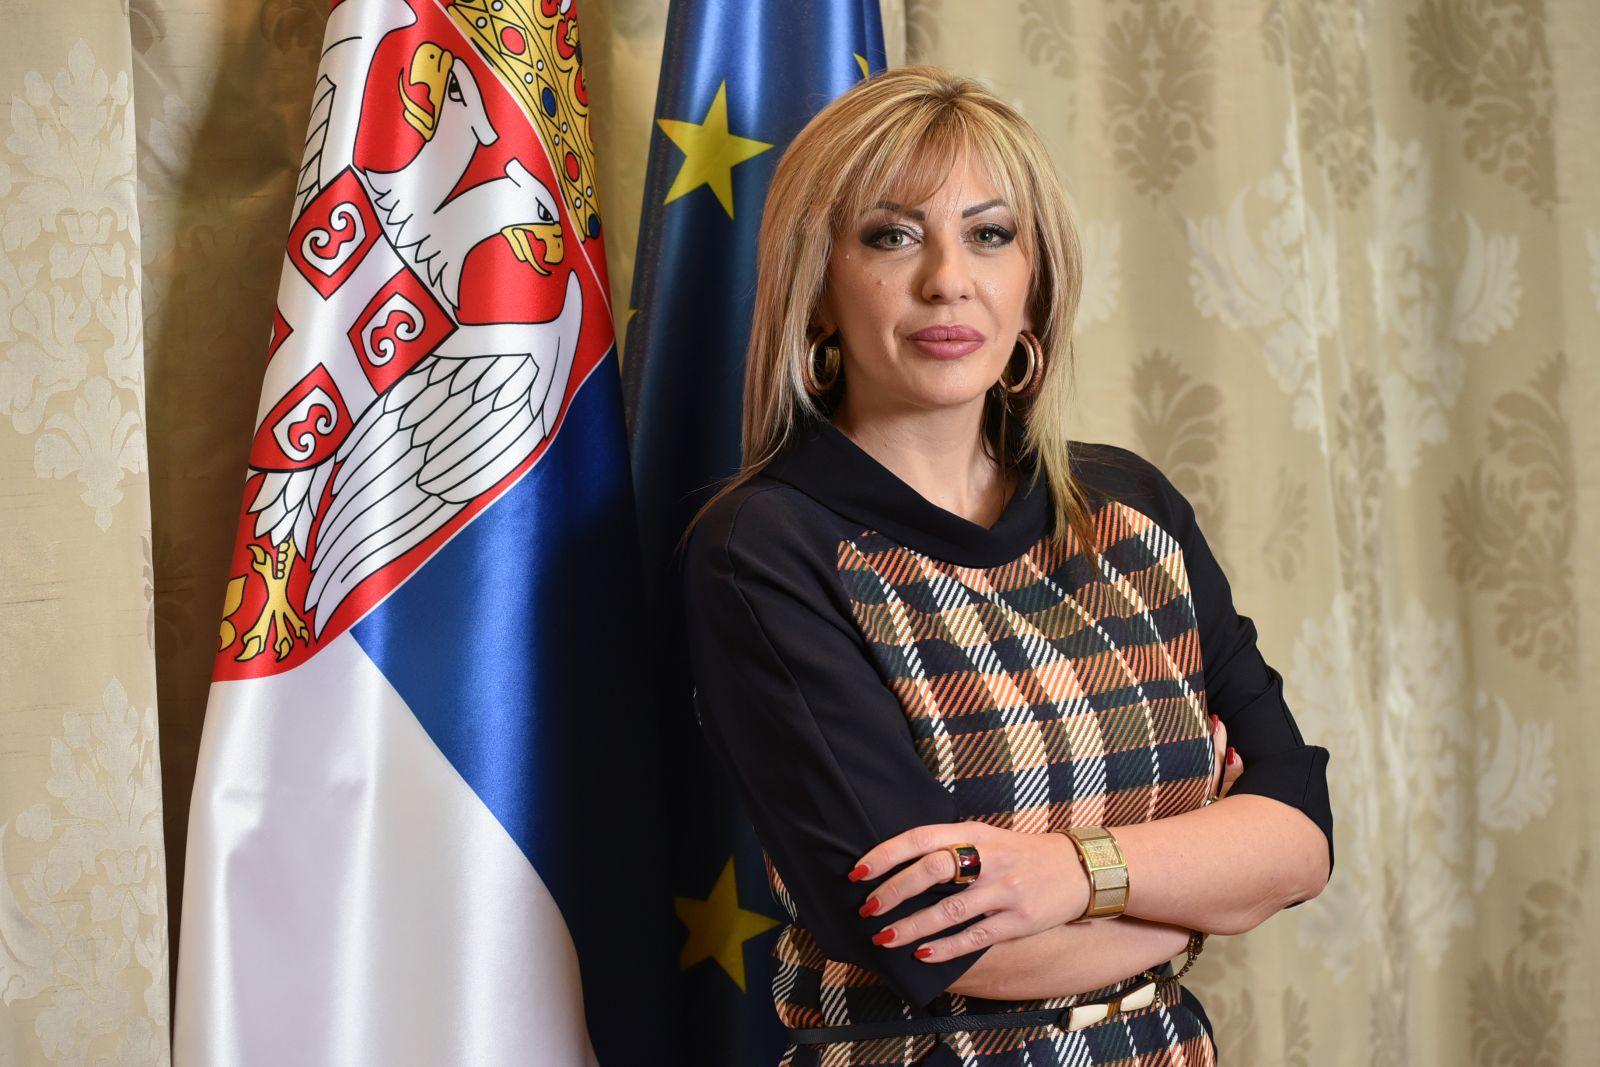 Јоксимовић и Едштадлер: Самит прилика за јасан сигнал ЗБ